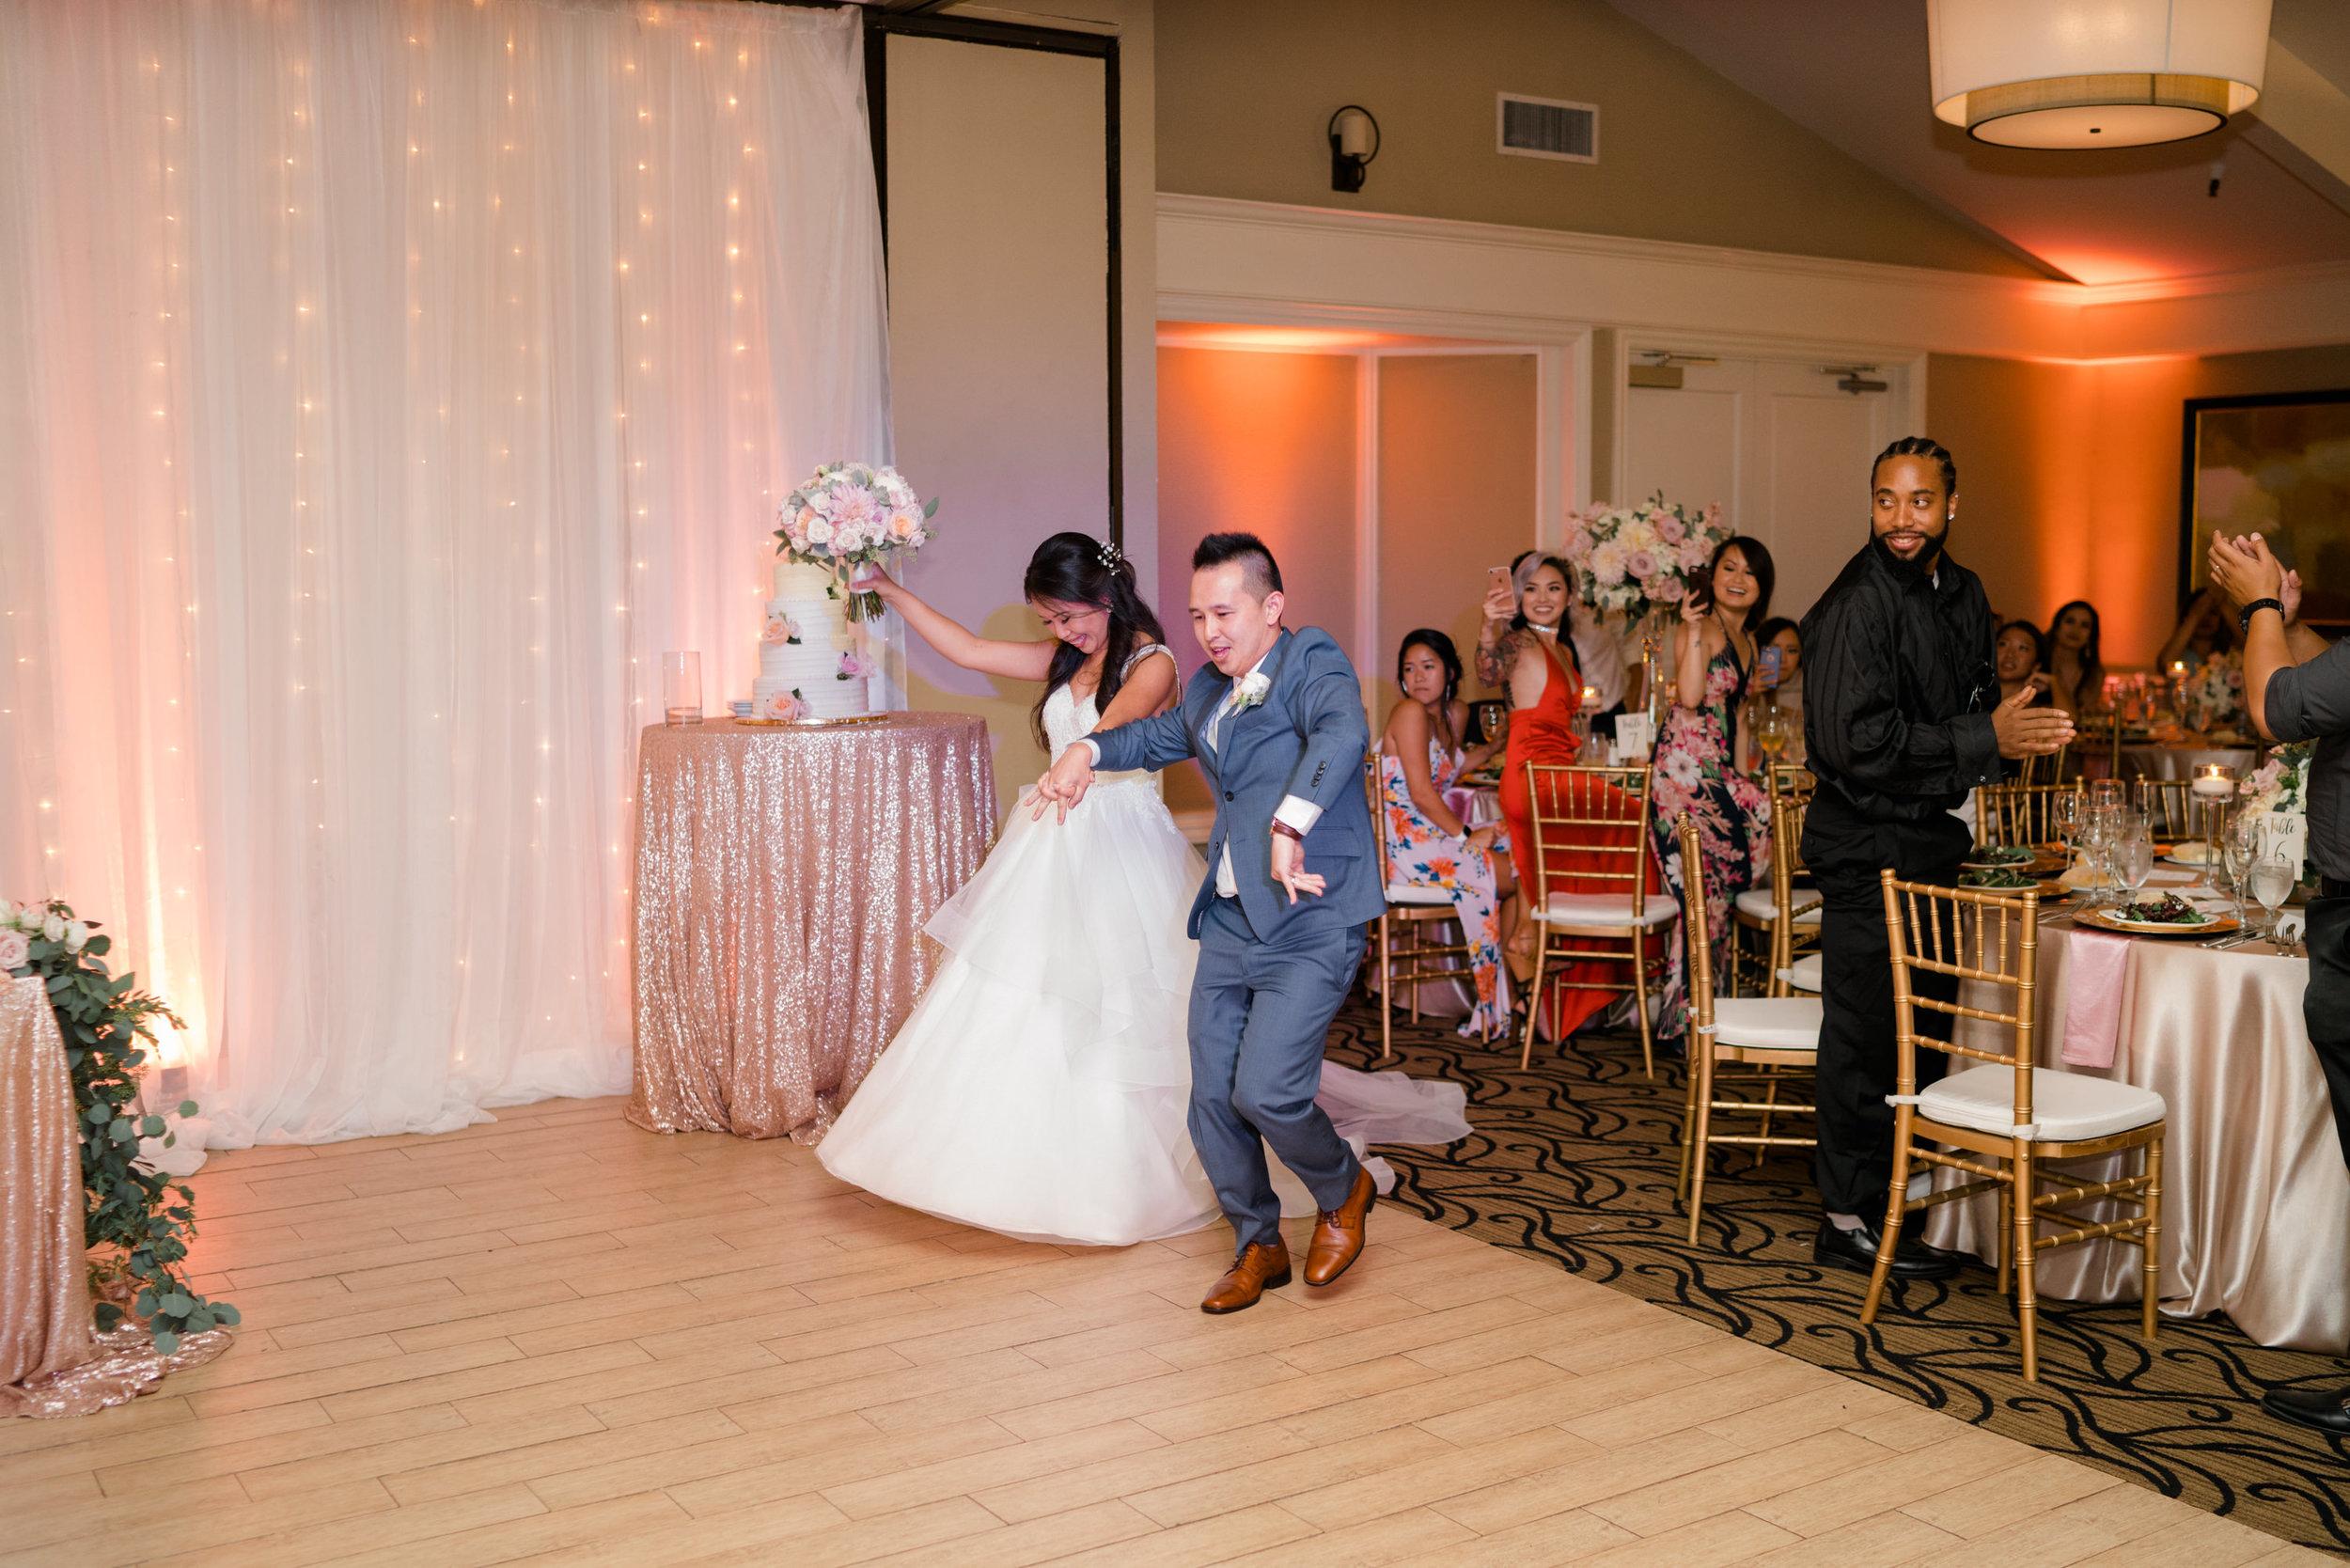 Maria and Nicholas enter their wedding reception at Morgan Run resort.